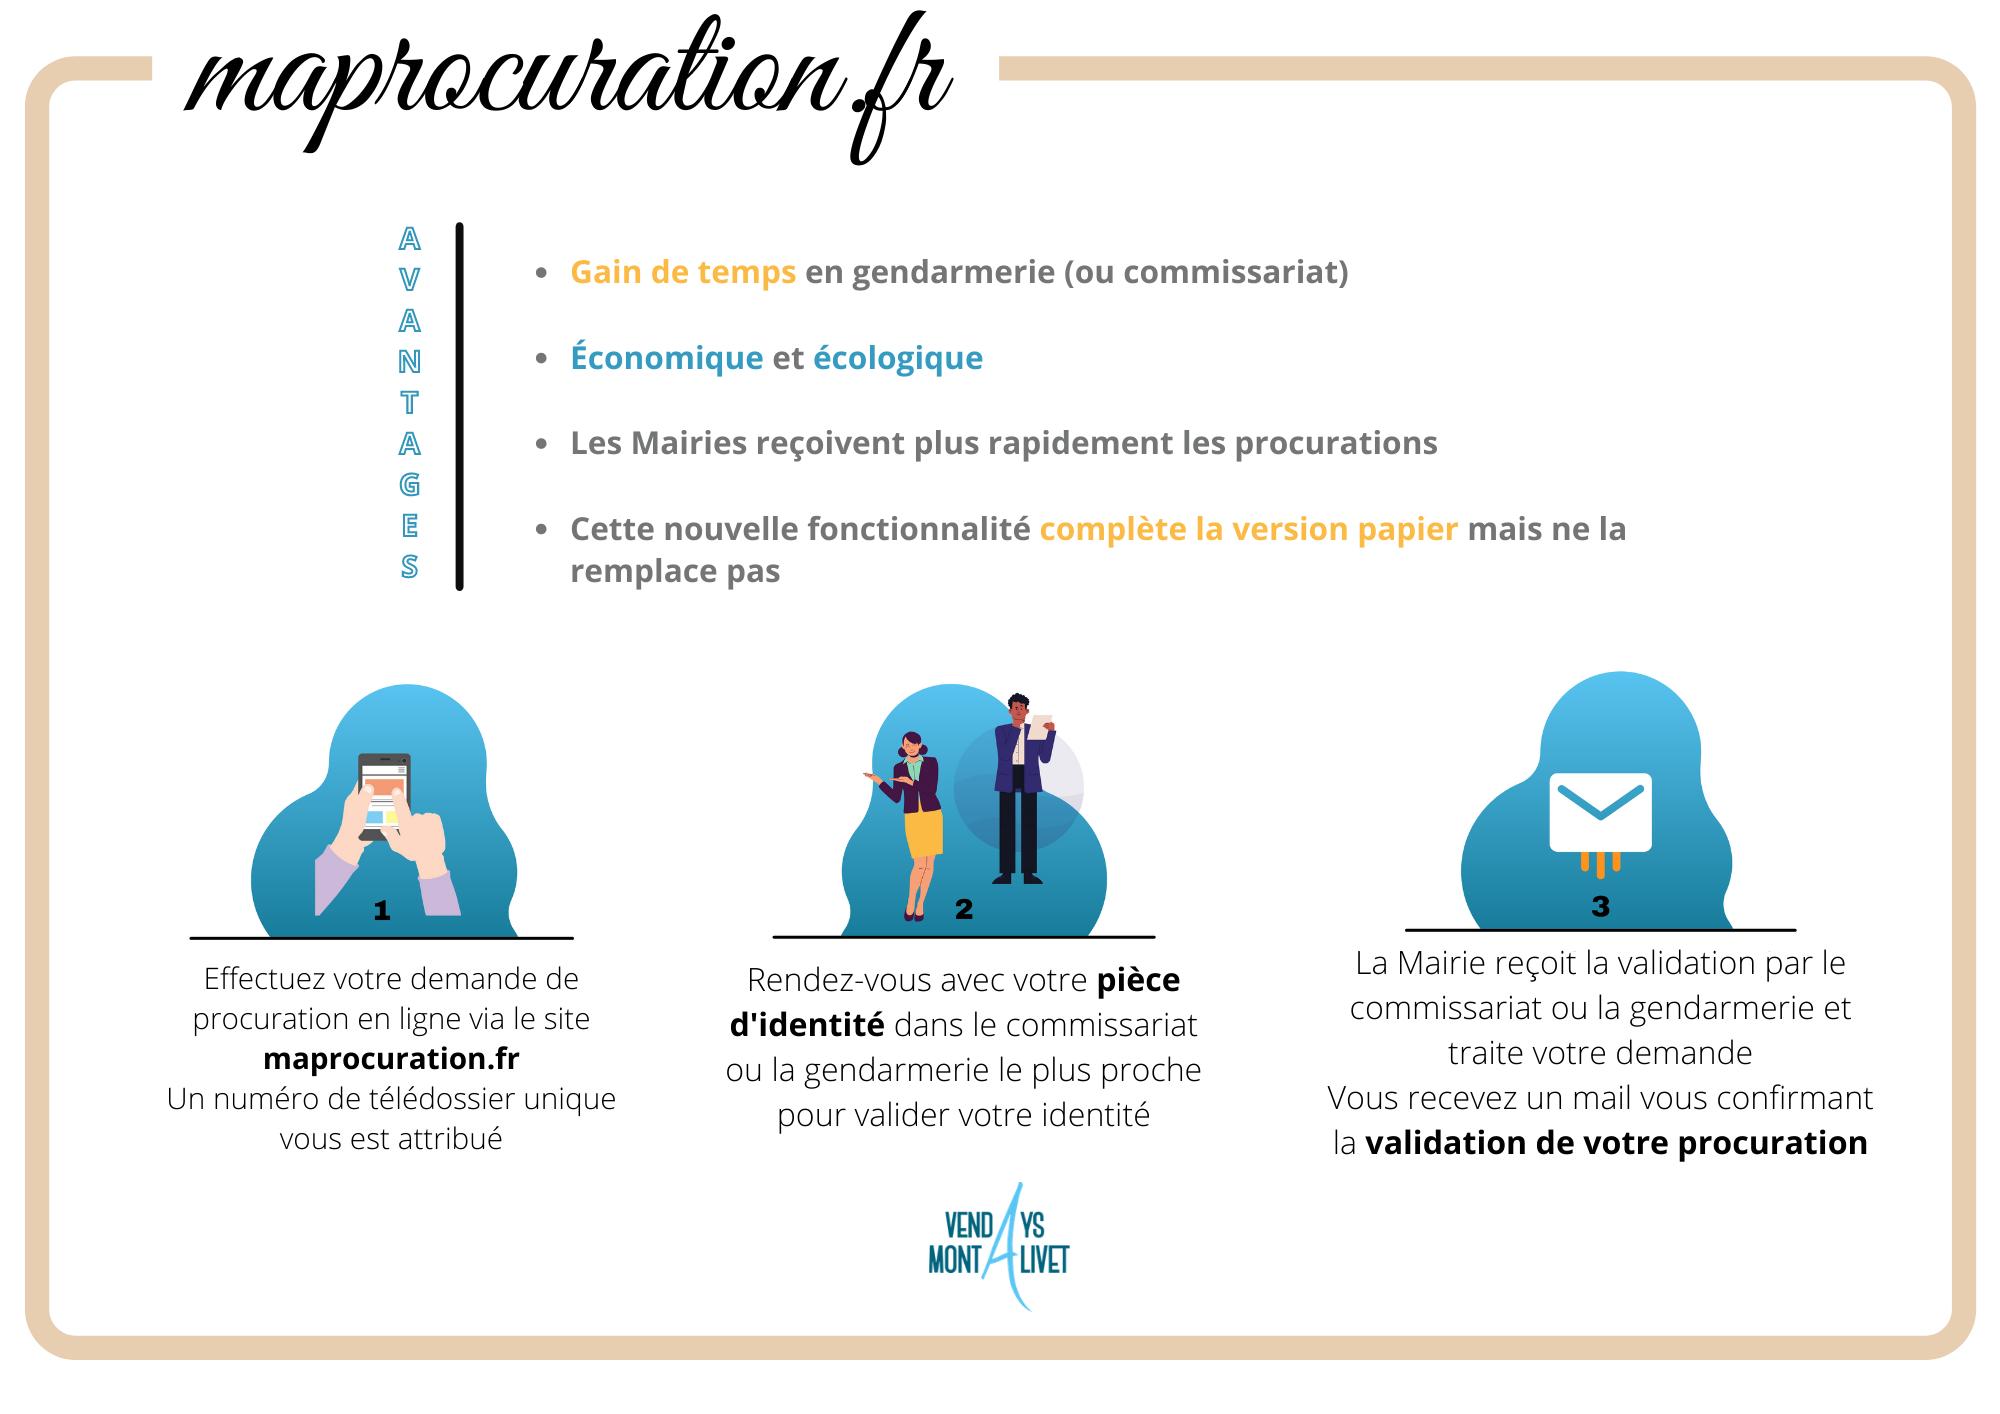 maprocuration.fr